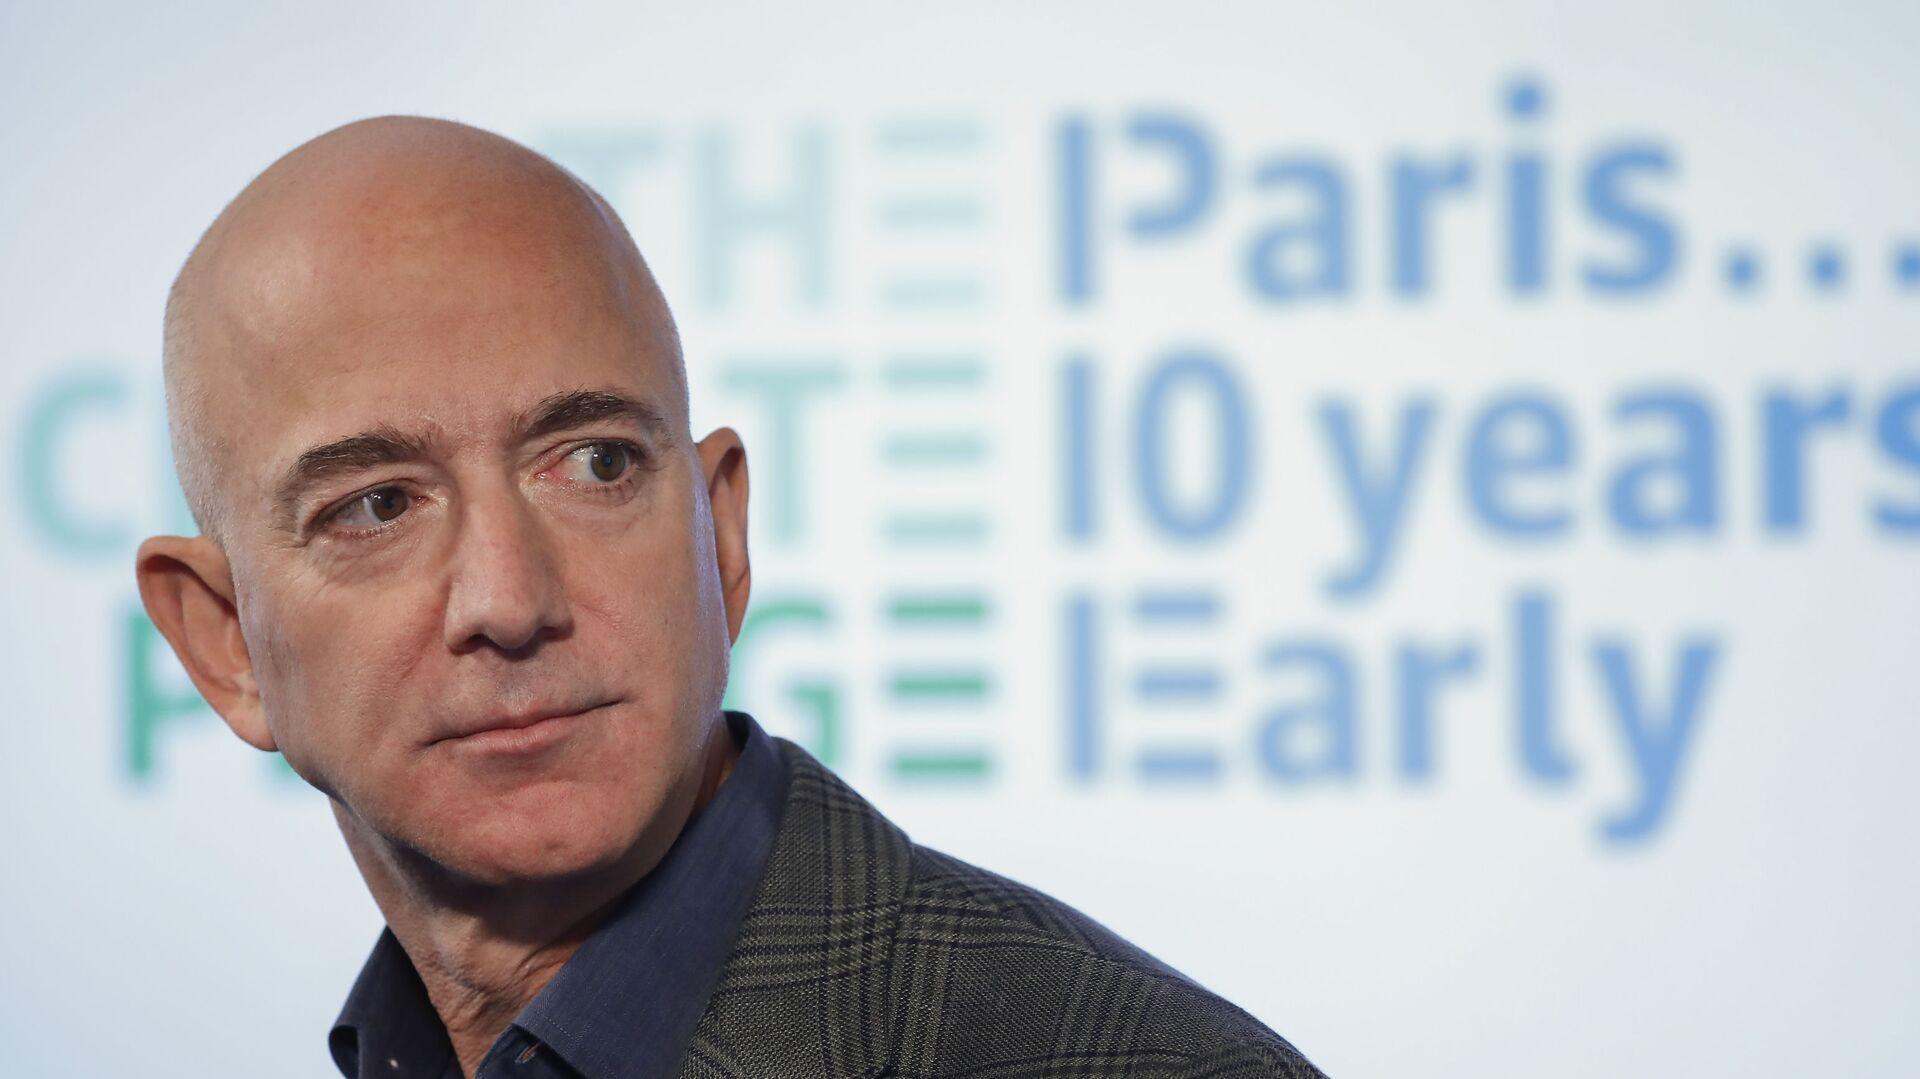 Zakladatel Amazonu Jeff Bezos  - Sputnik Česká republika, 1920, 07.09.2021